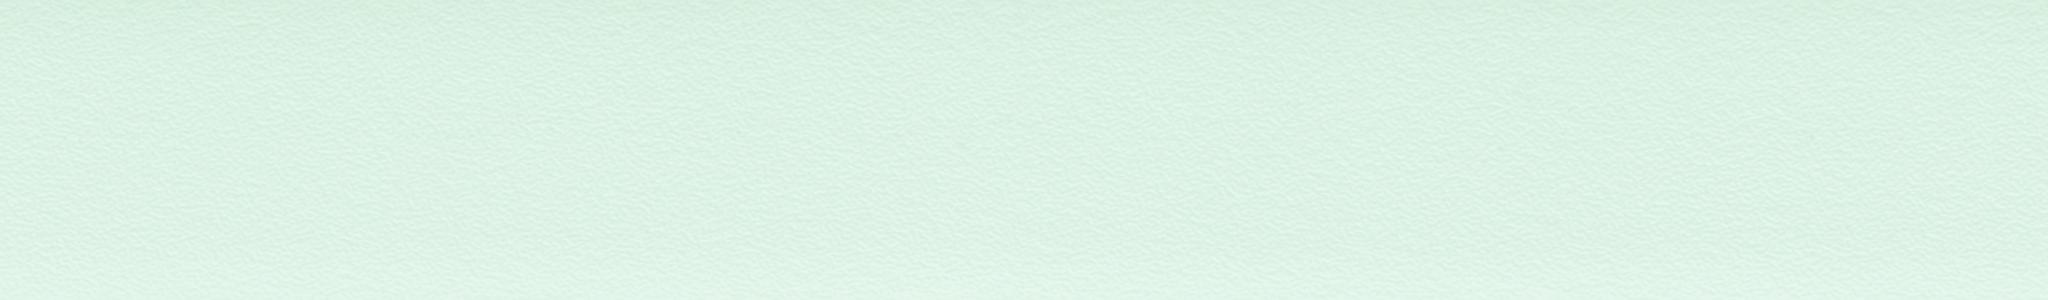 HU 161311 кромка ABS зеленая светлая жемчуг 101